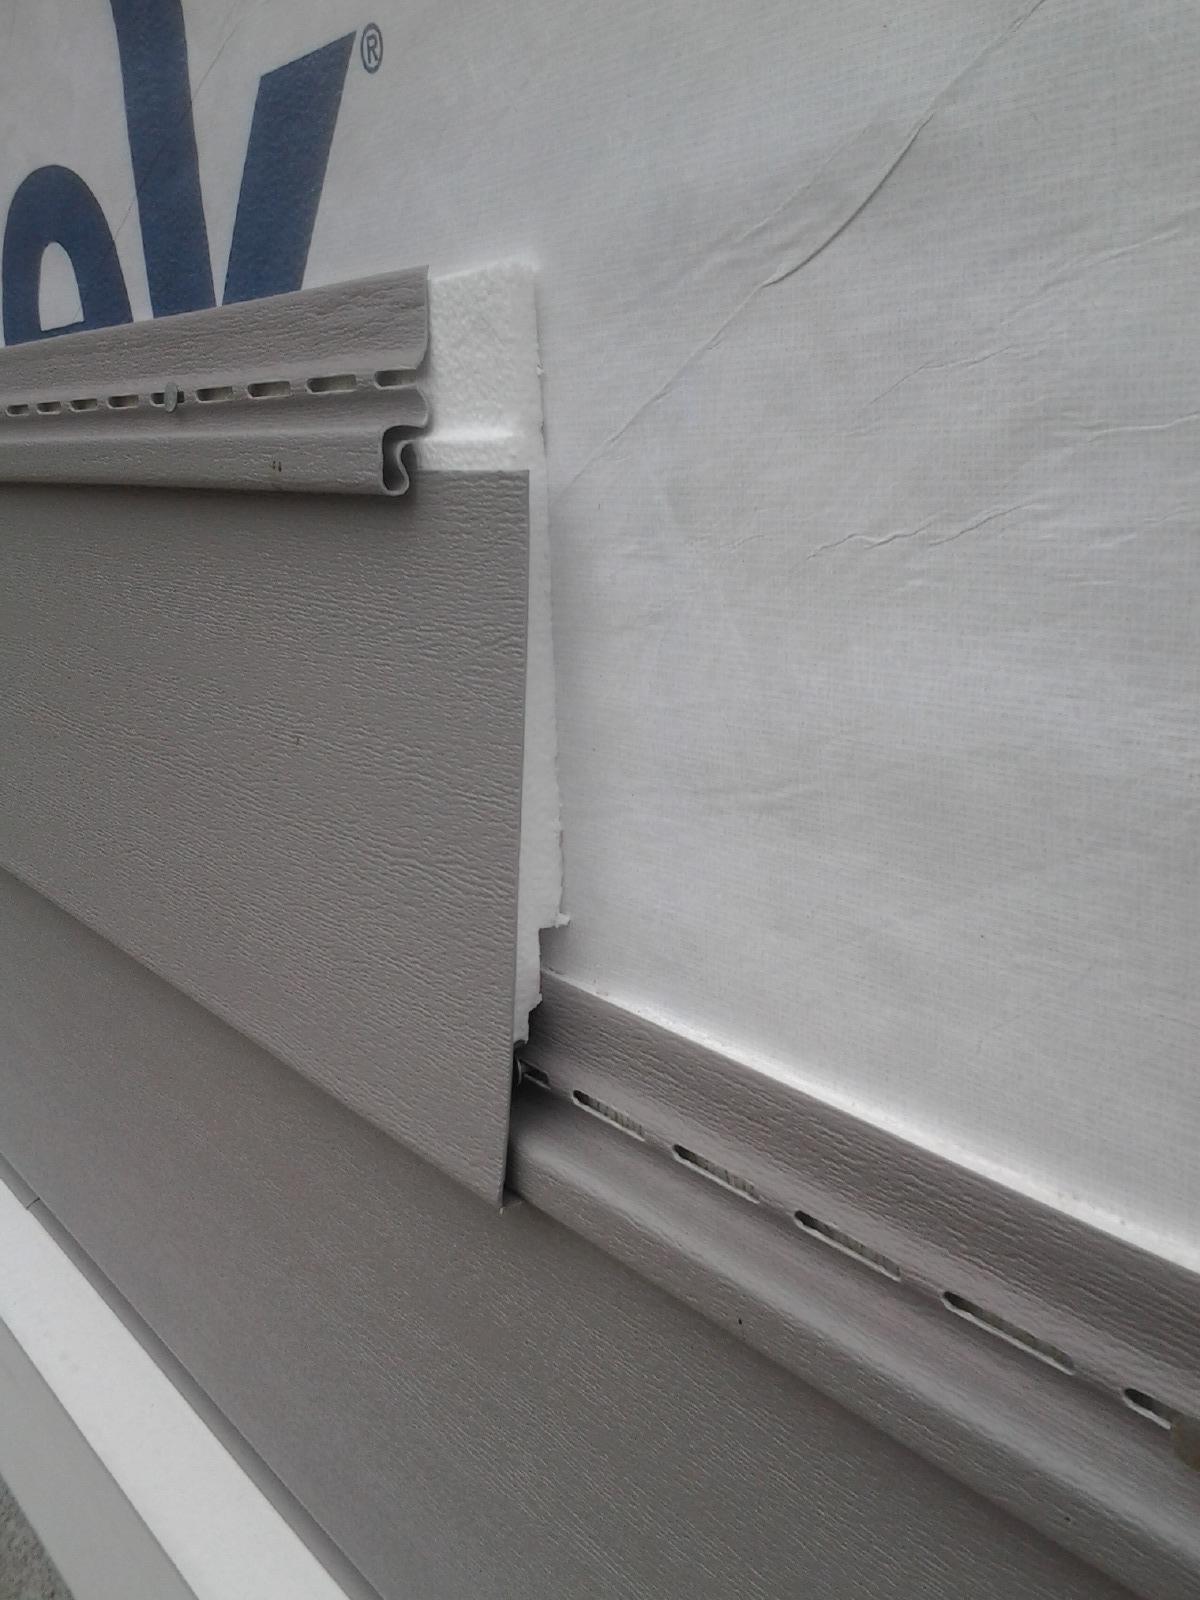 Foam backed vinyl siding-0627150940a.jpg